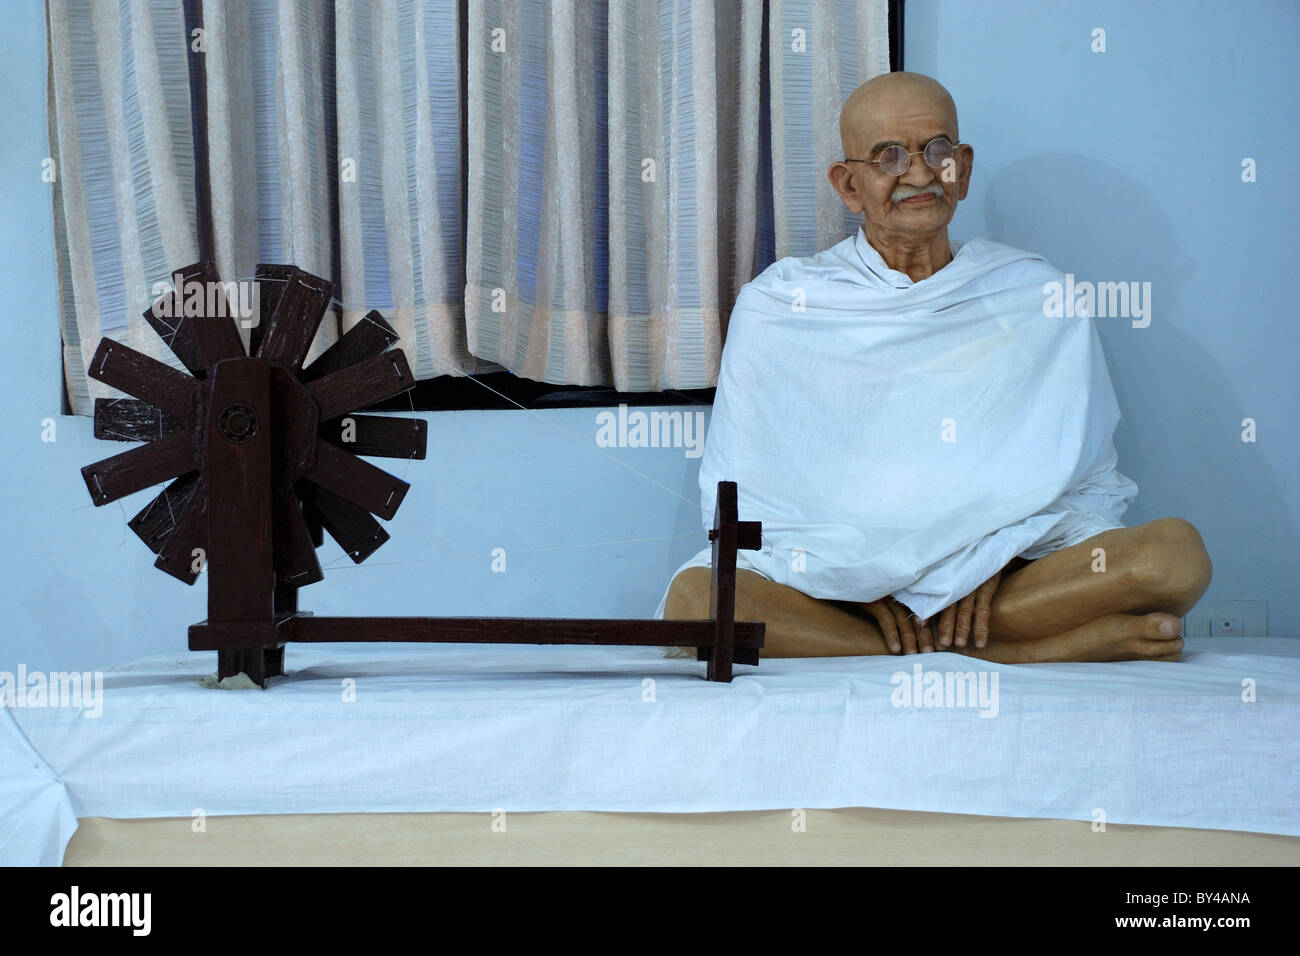 wax model of Mohandas Karamchand Gandhi or mahatma gandhi in bay watch water theme park,kanyakumari,tamilnadu,india - Stock Image